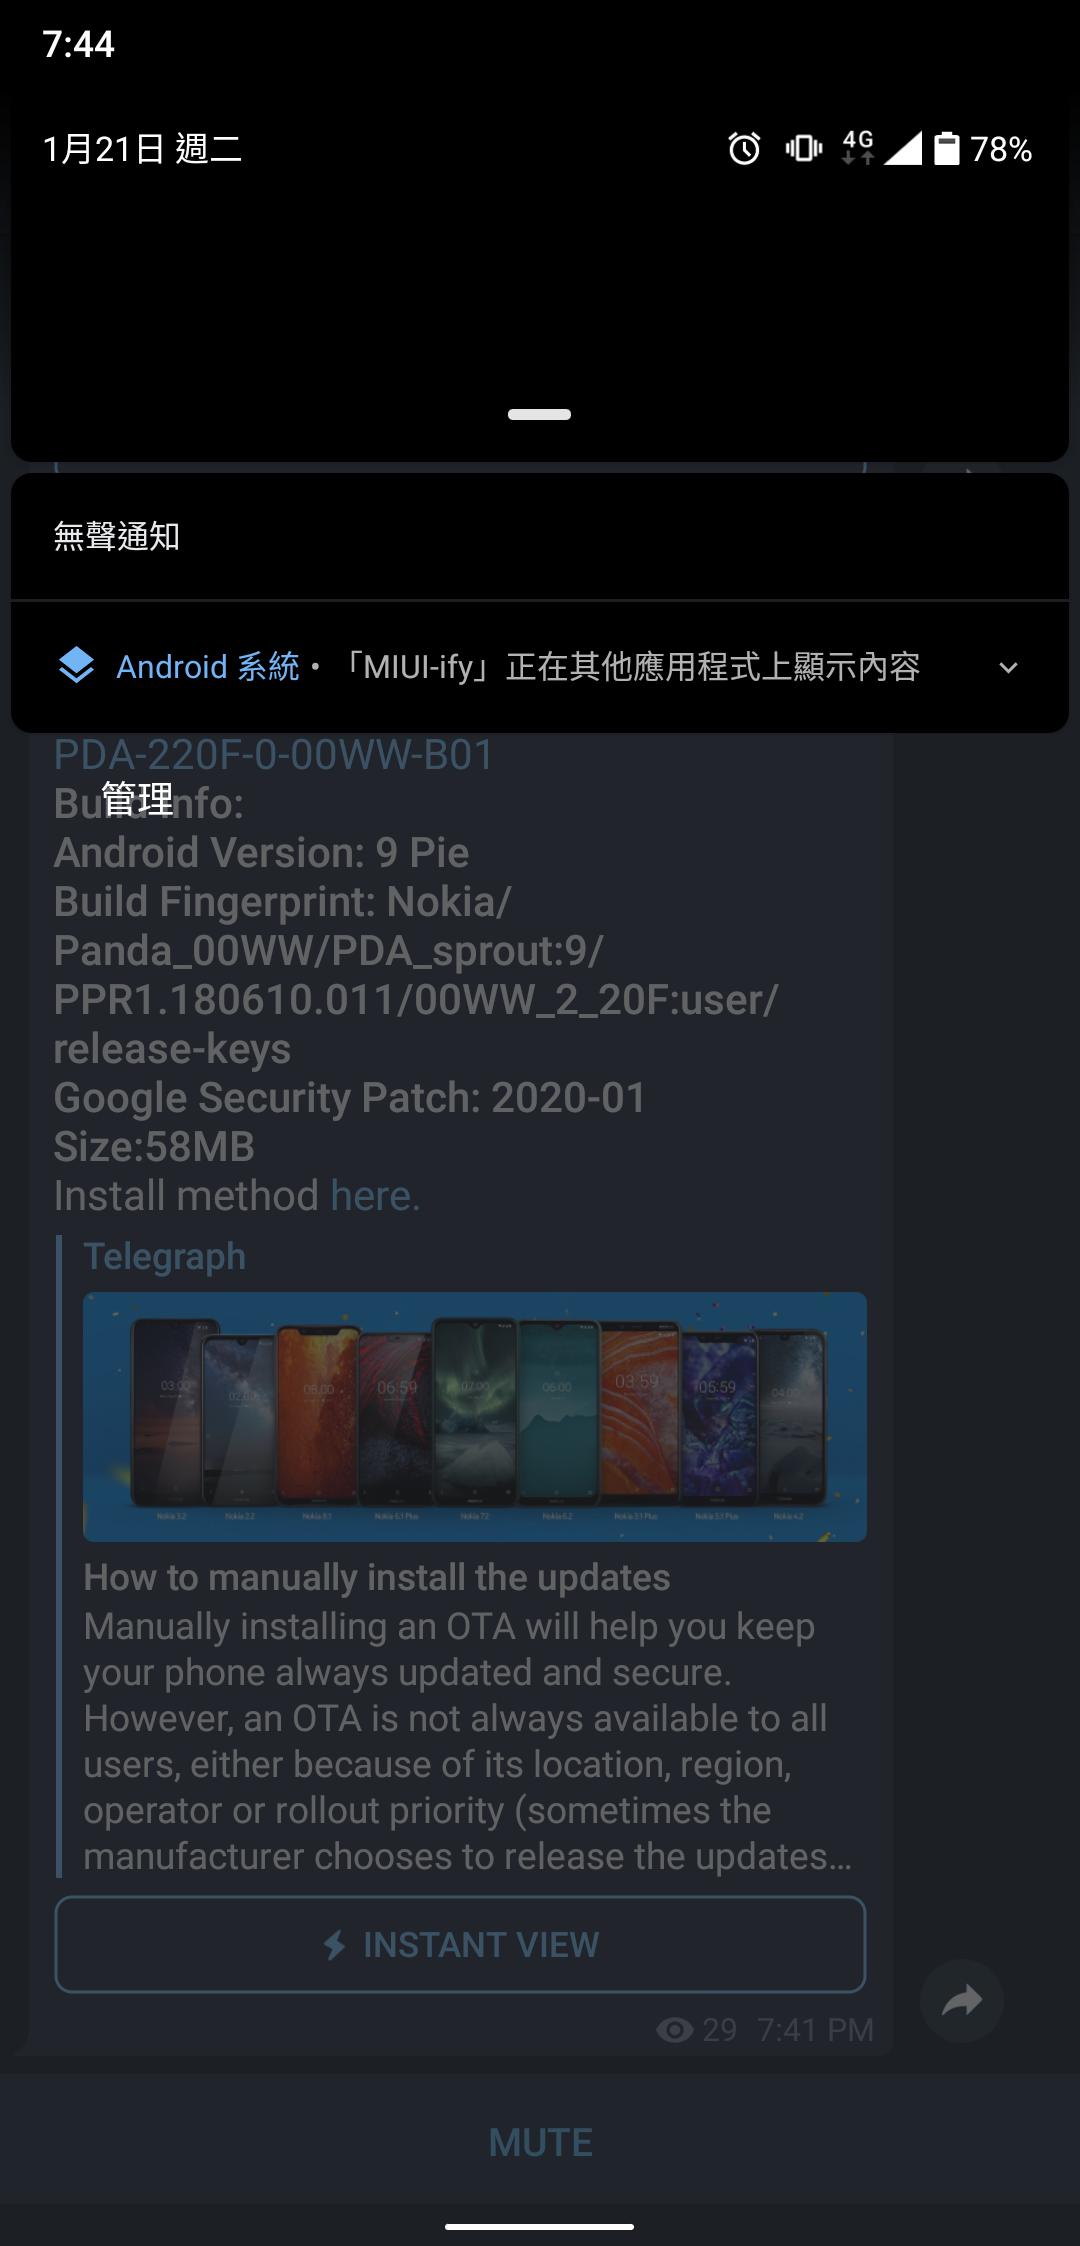 Screenshot_20200121-194446.png